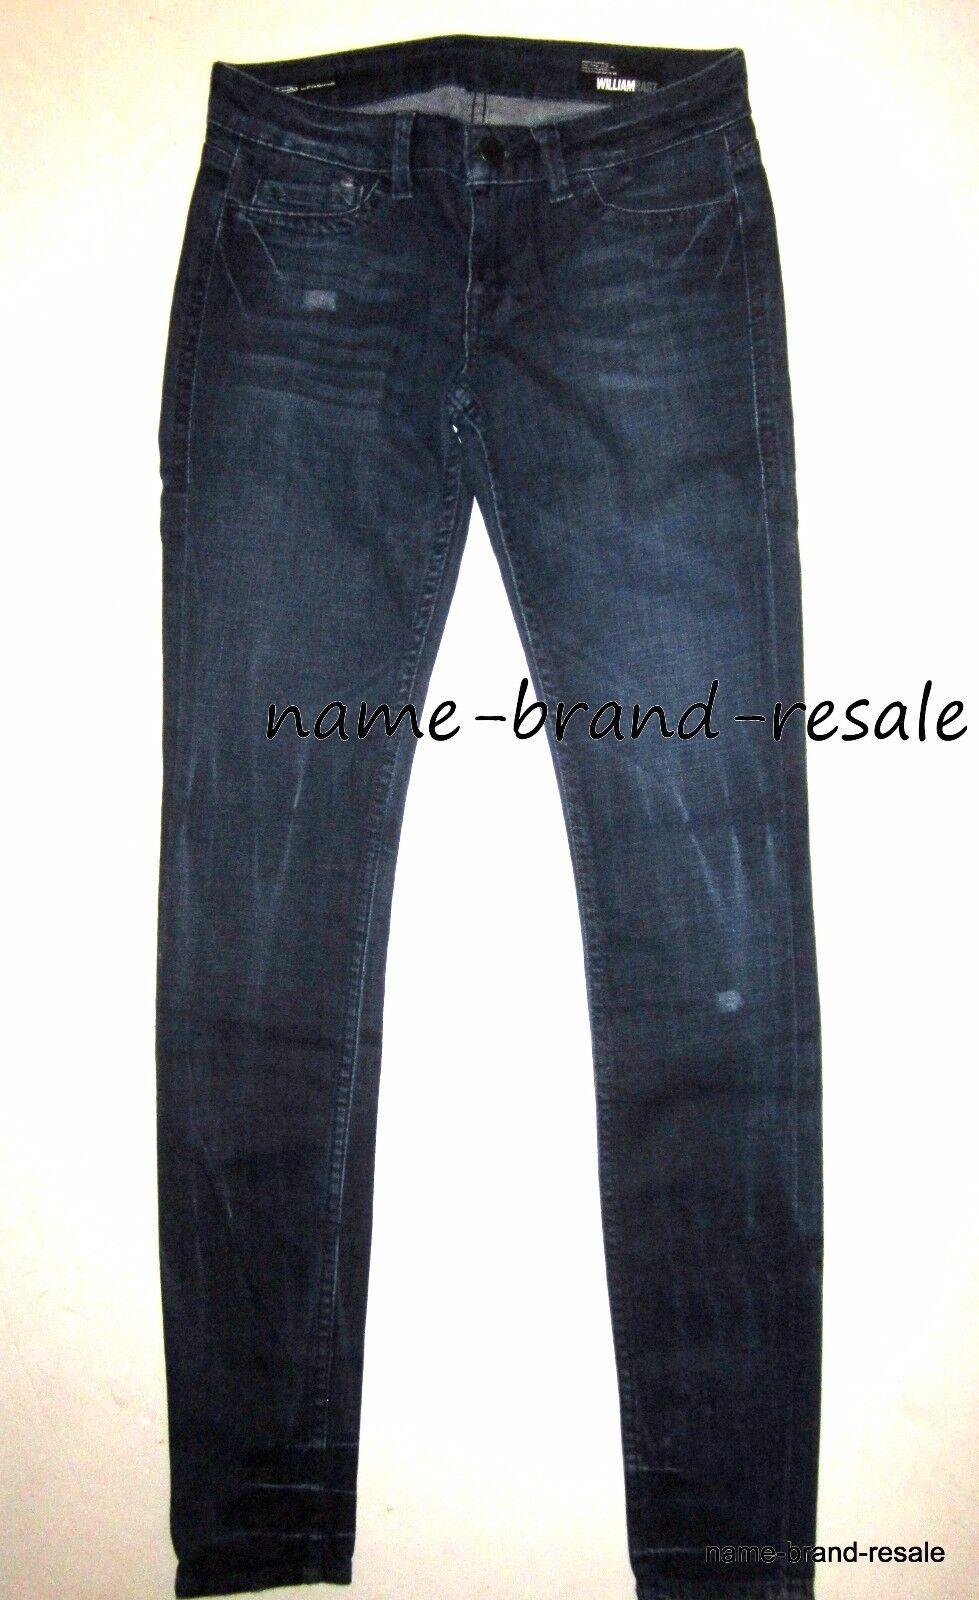 WILLIAM RAST NEW  Sienna LEGGING Jeans WOMENS 26 x 32 Skinny Leg Dark Denim